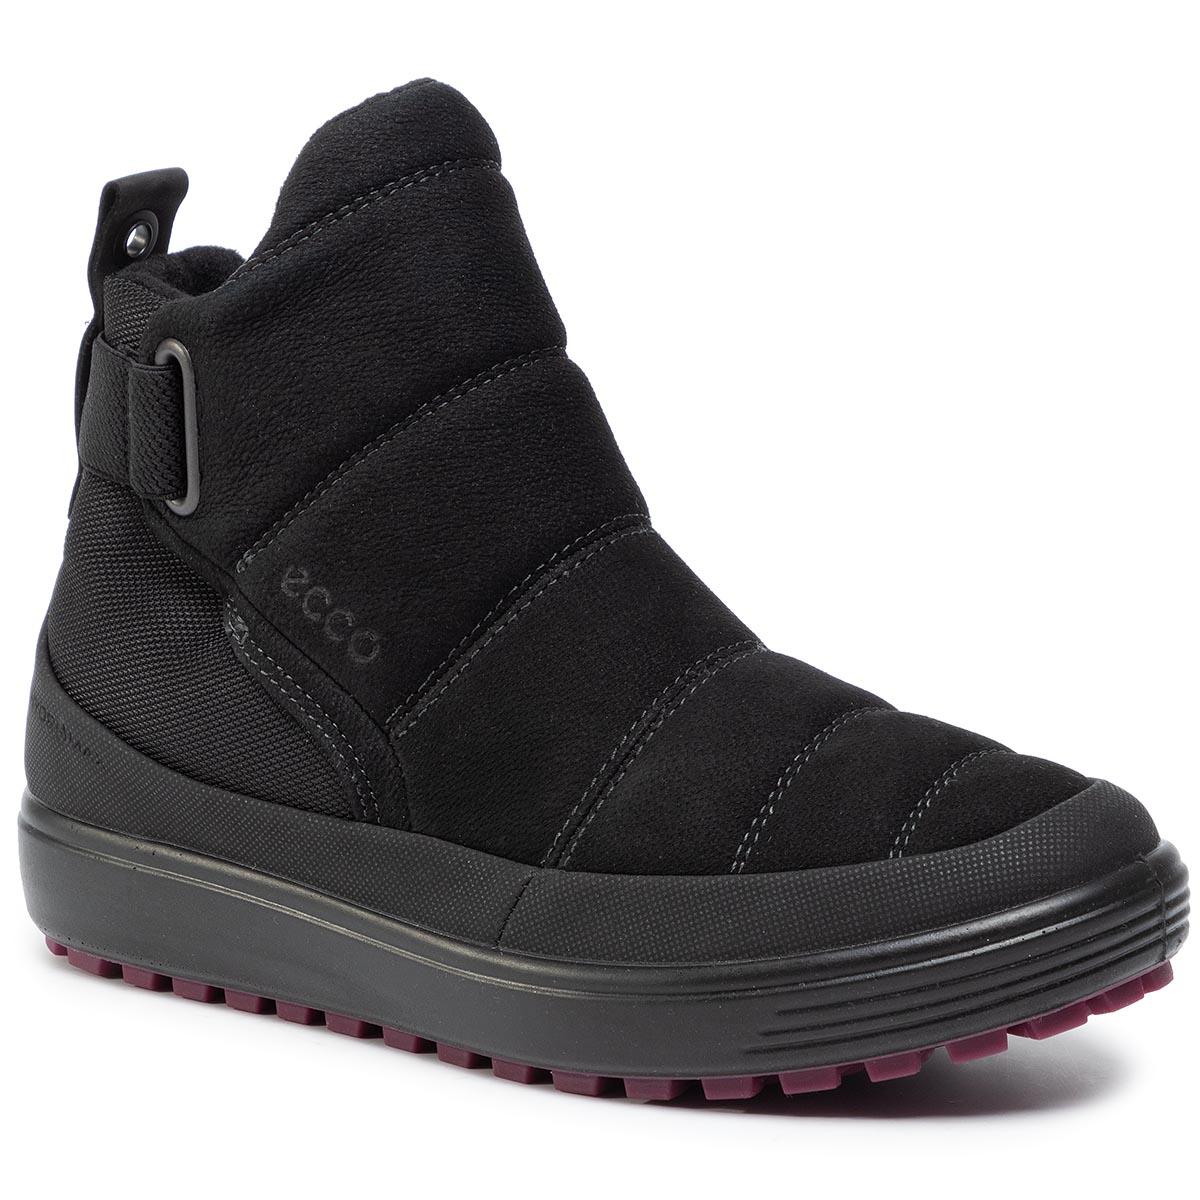 ECCO Damen Soft 7 Tred M Stiefeletten: : Schuhe